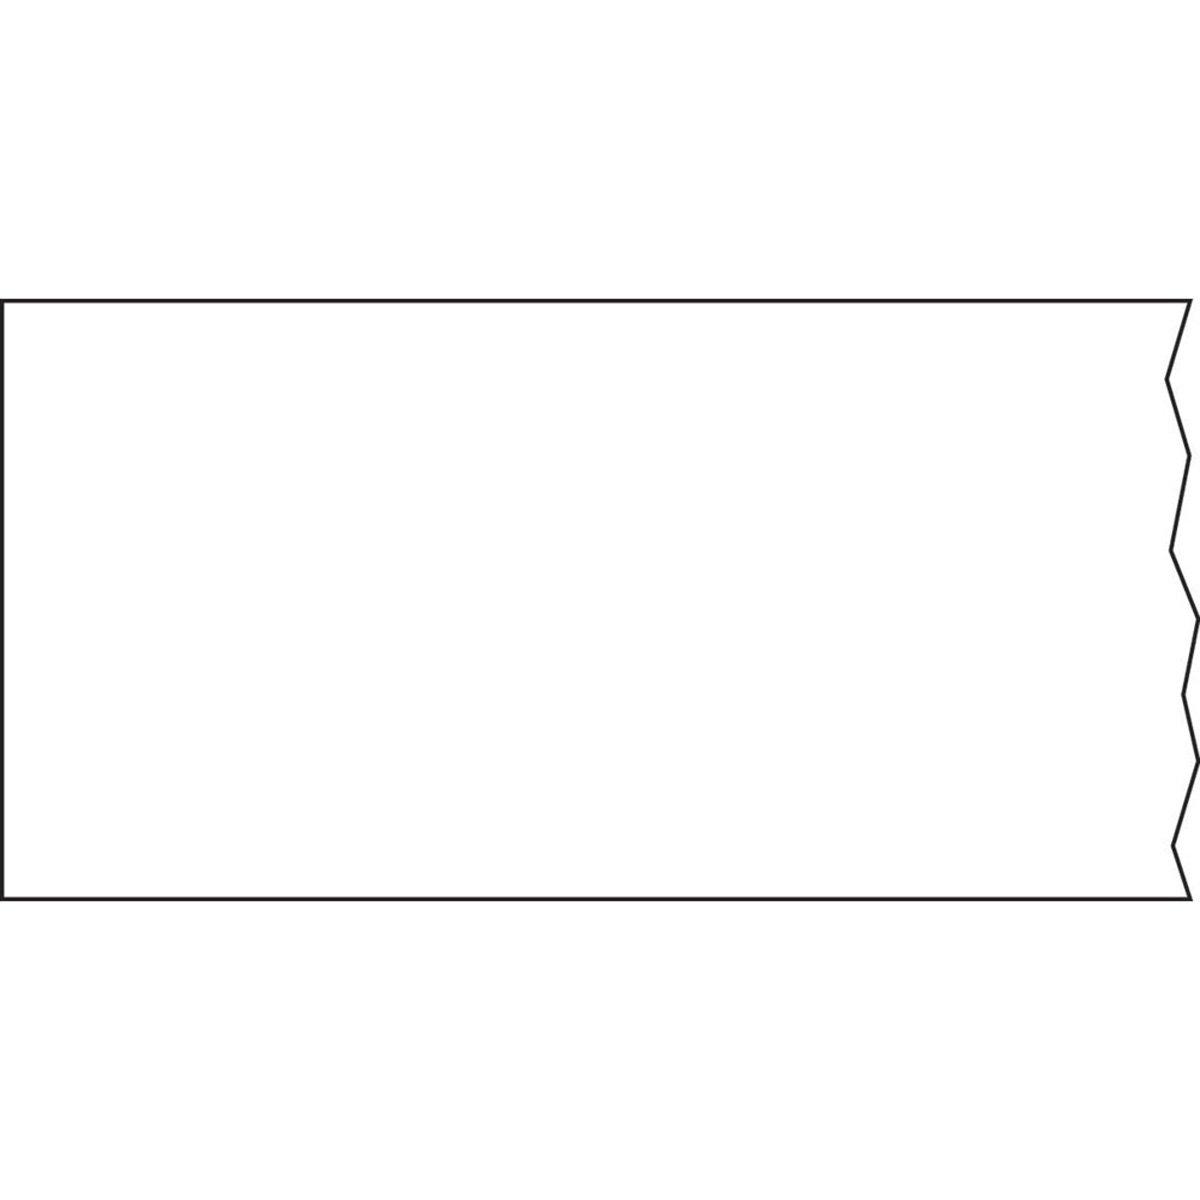 TIMETAPE T-502-1 Tape, Removable, 1'' Core, 2'' x 500'', Imprints White (Pack of 1)